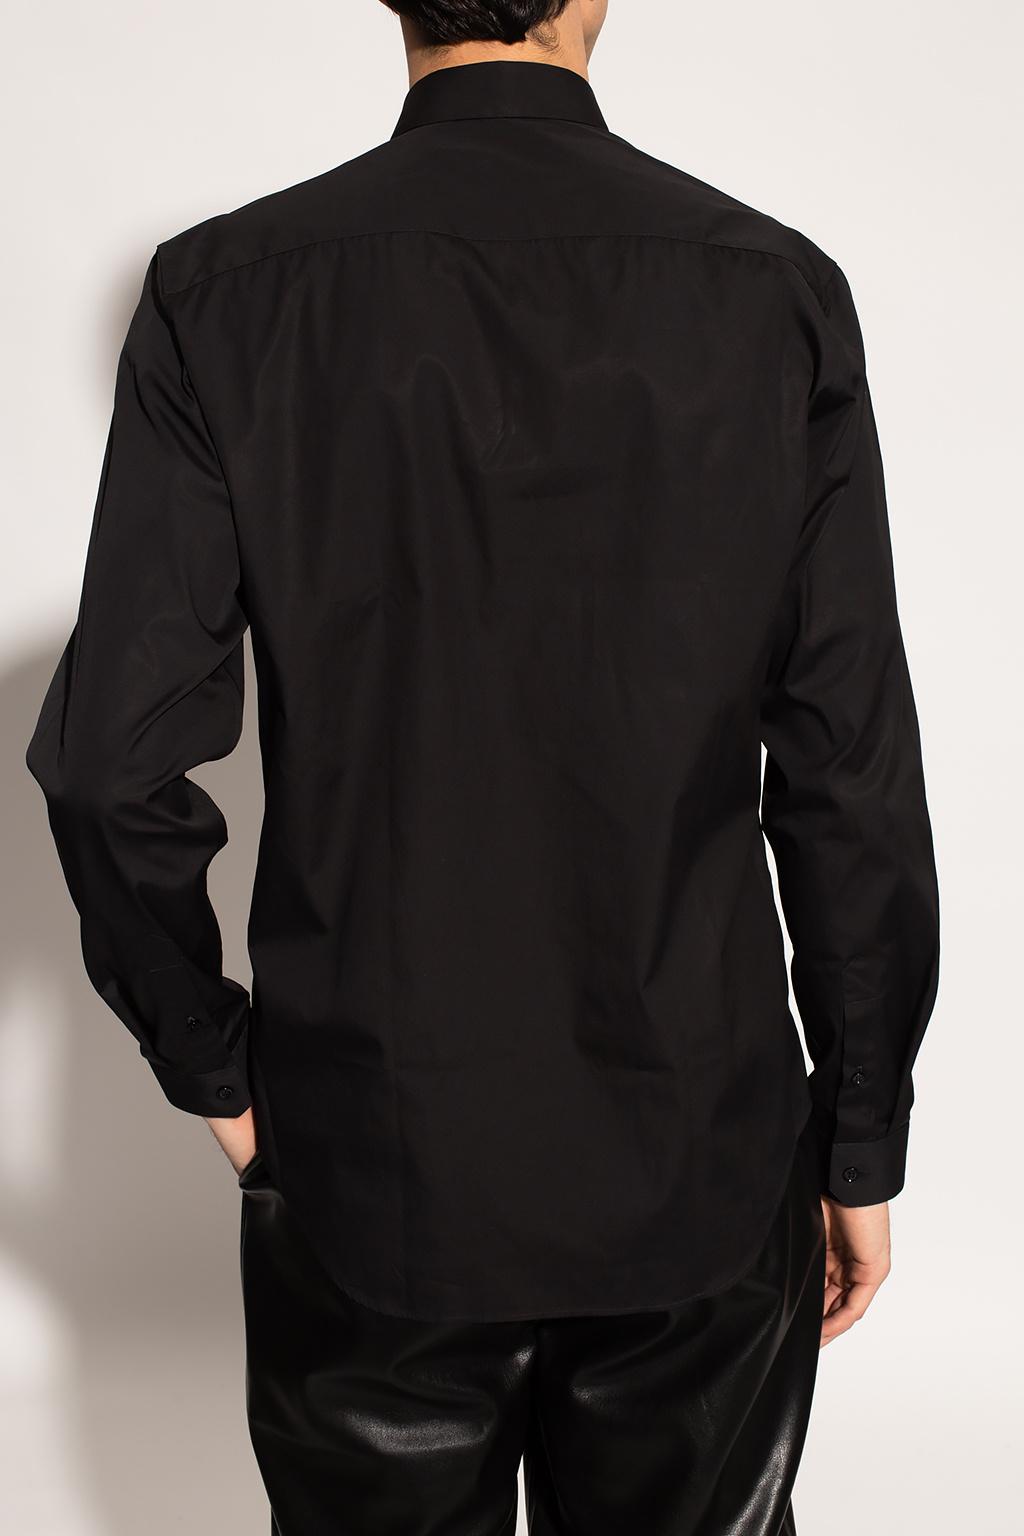 Versace Shirt with Medusa head